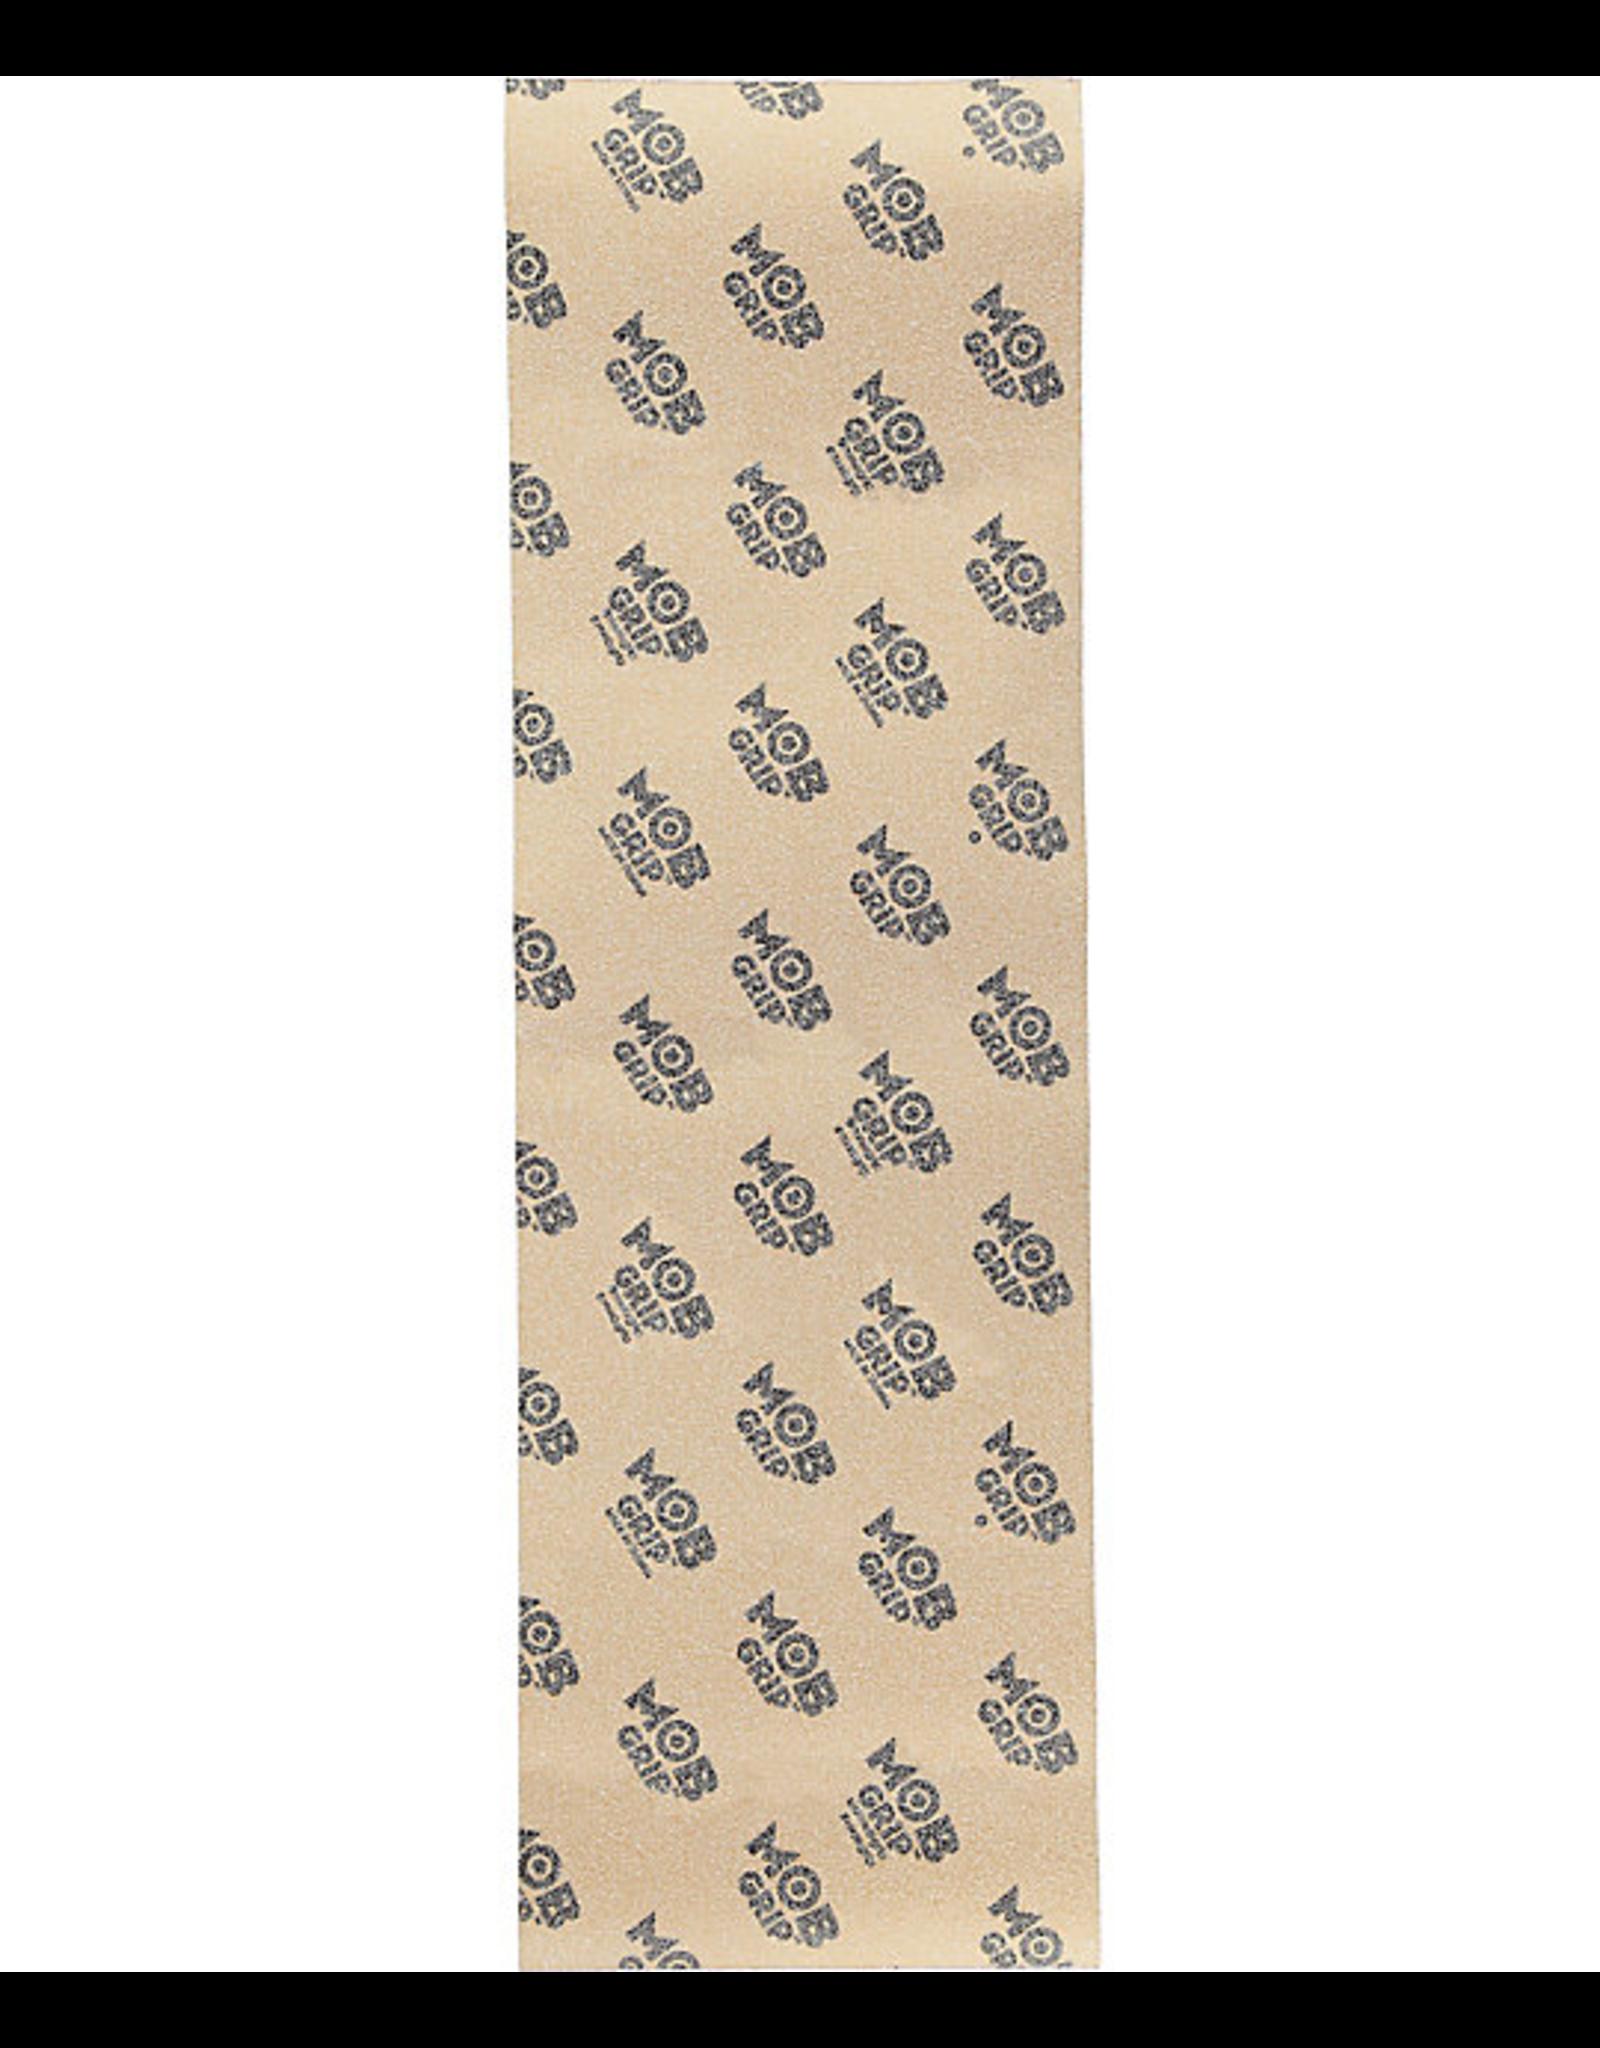 MOB COARSE CLEAR GRIP TAPE SHEET (10X33)